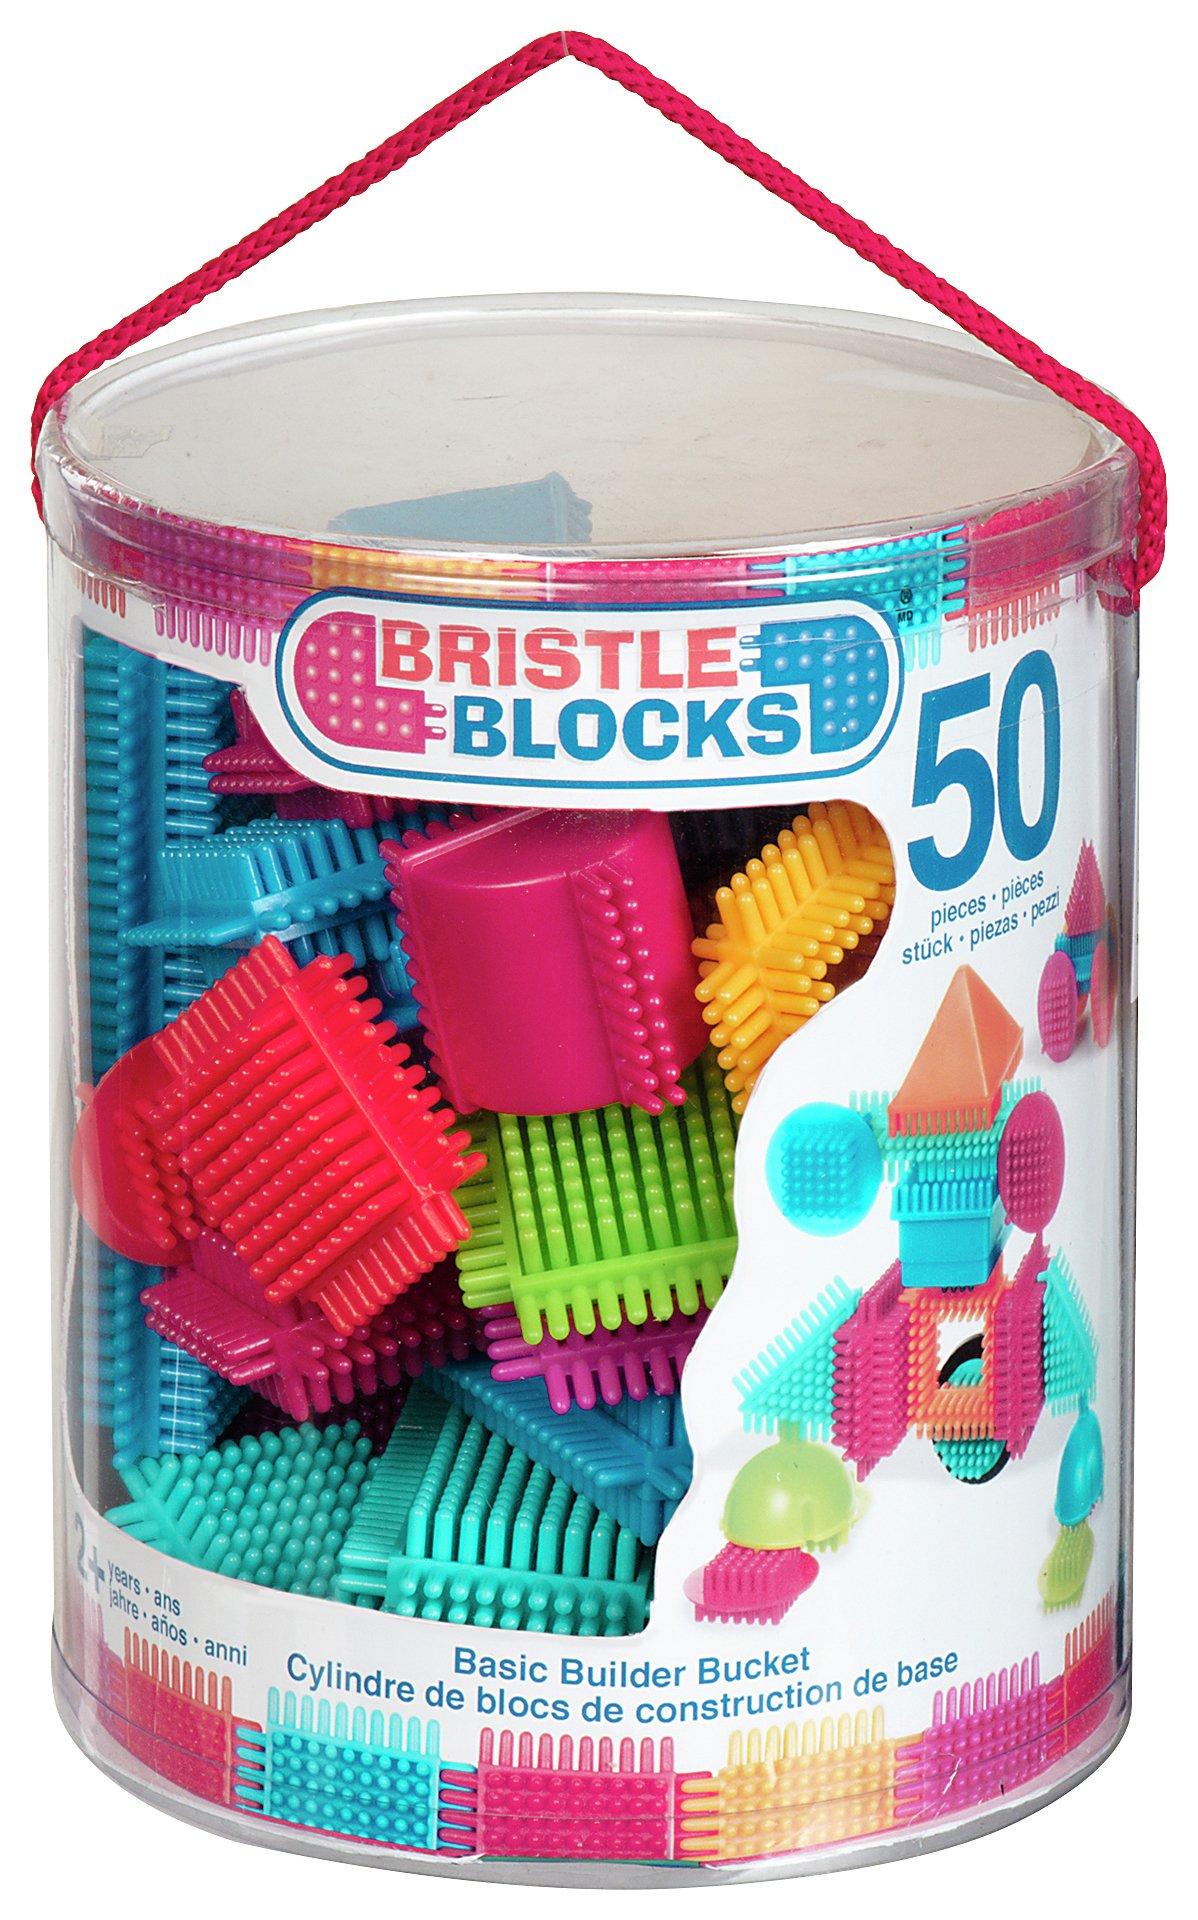 Image of Bristle Blocks Basic Builder Bucket.